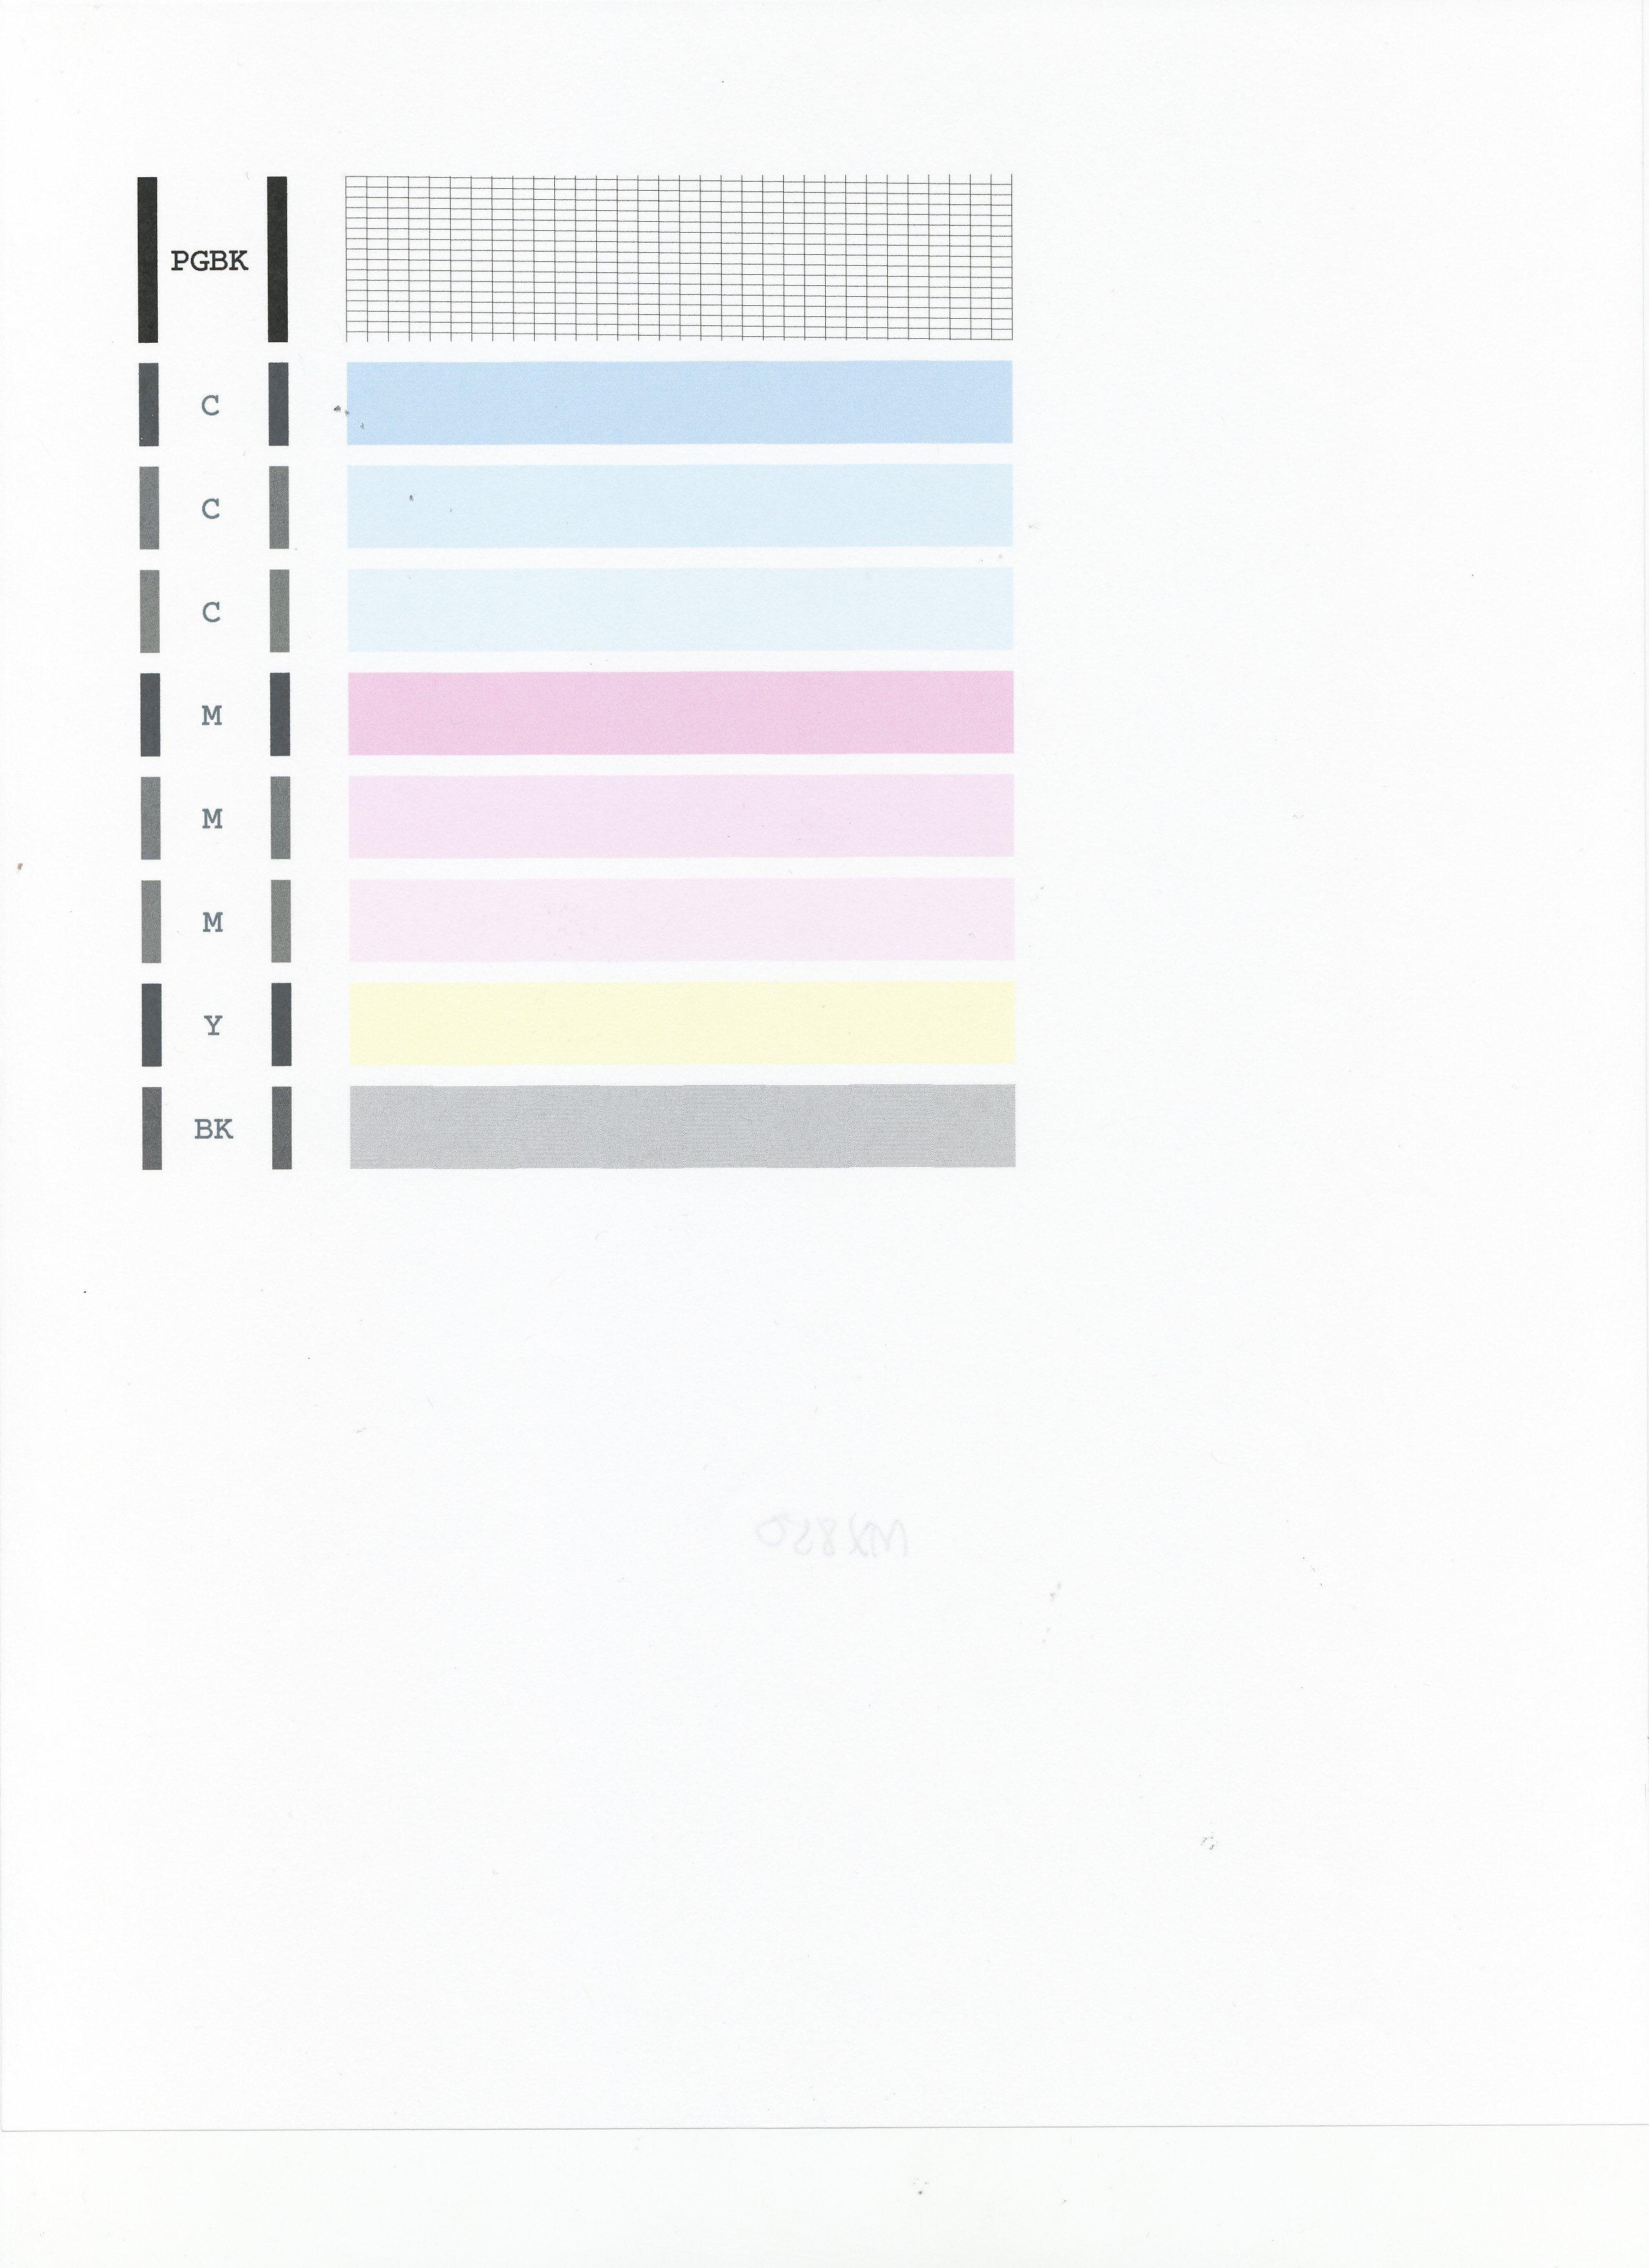 MX870 Nozzle Test.jpg